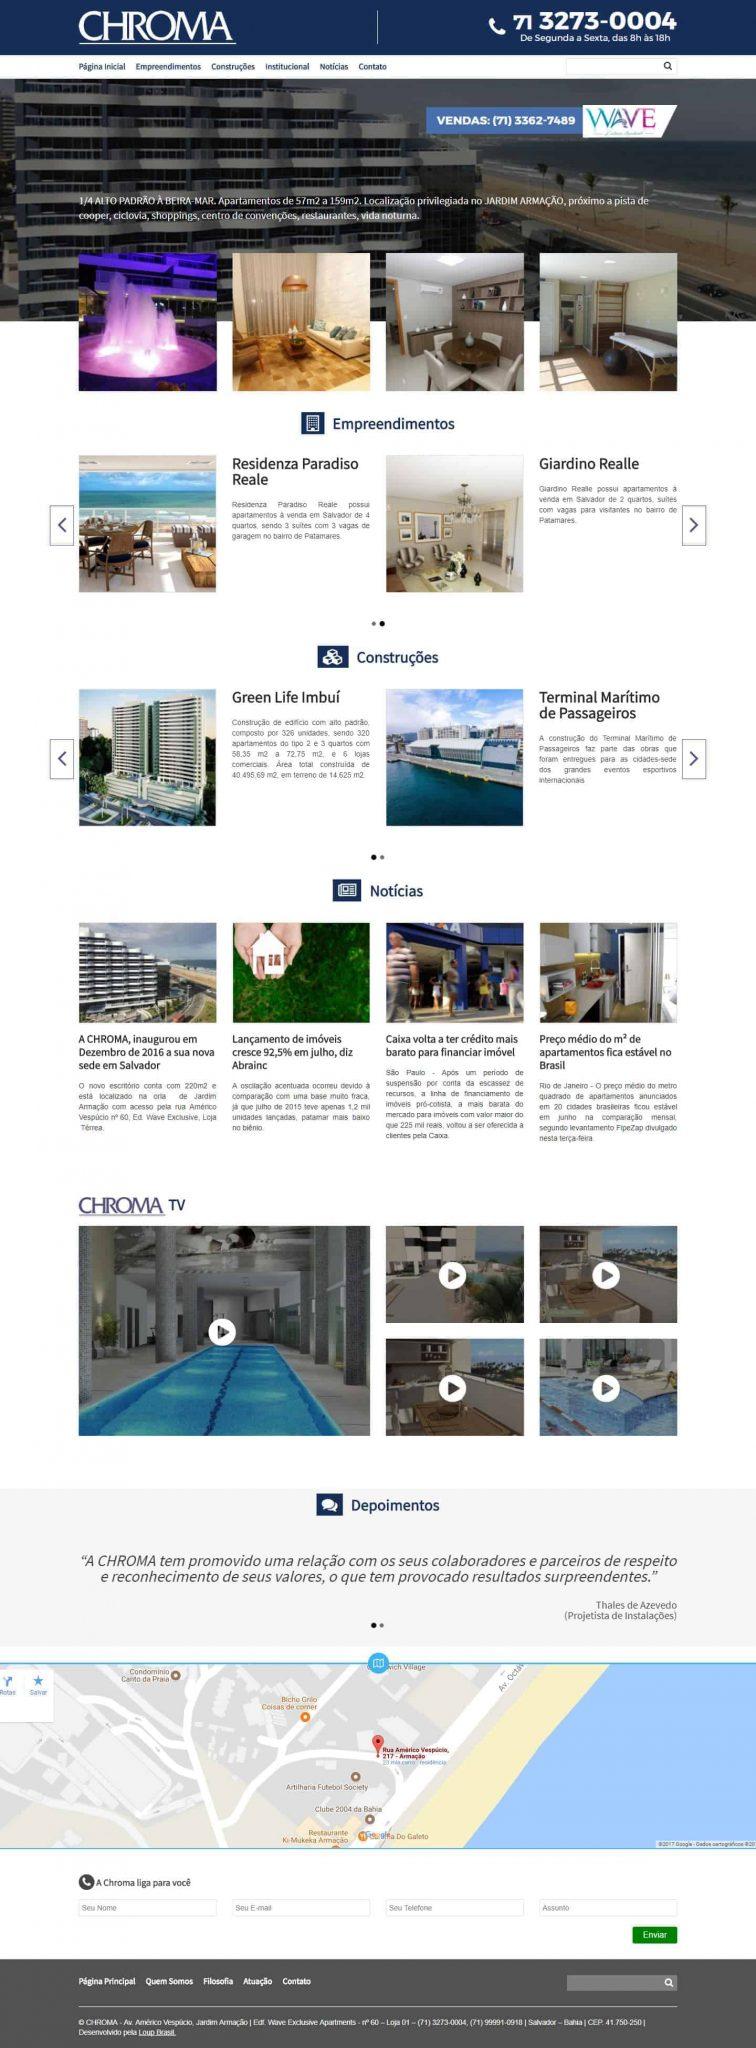 Página principal da CRHOMA Empreendimentos.